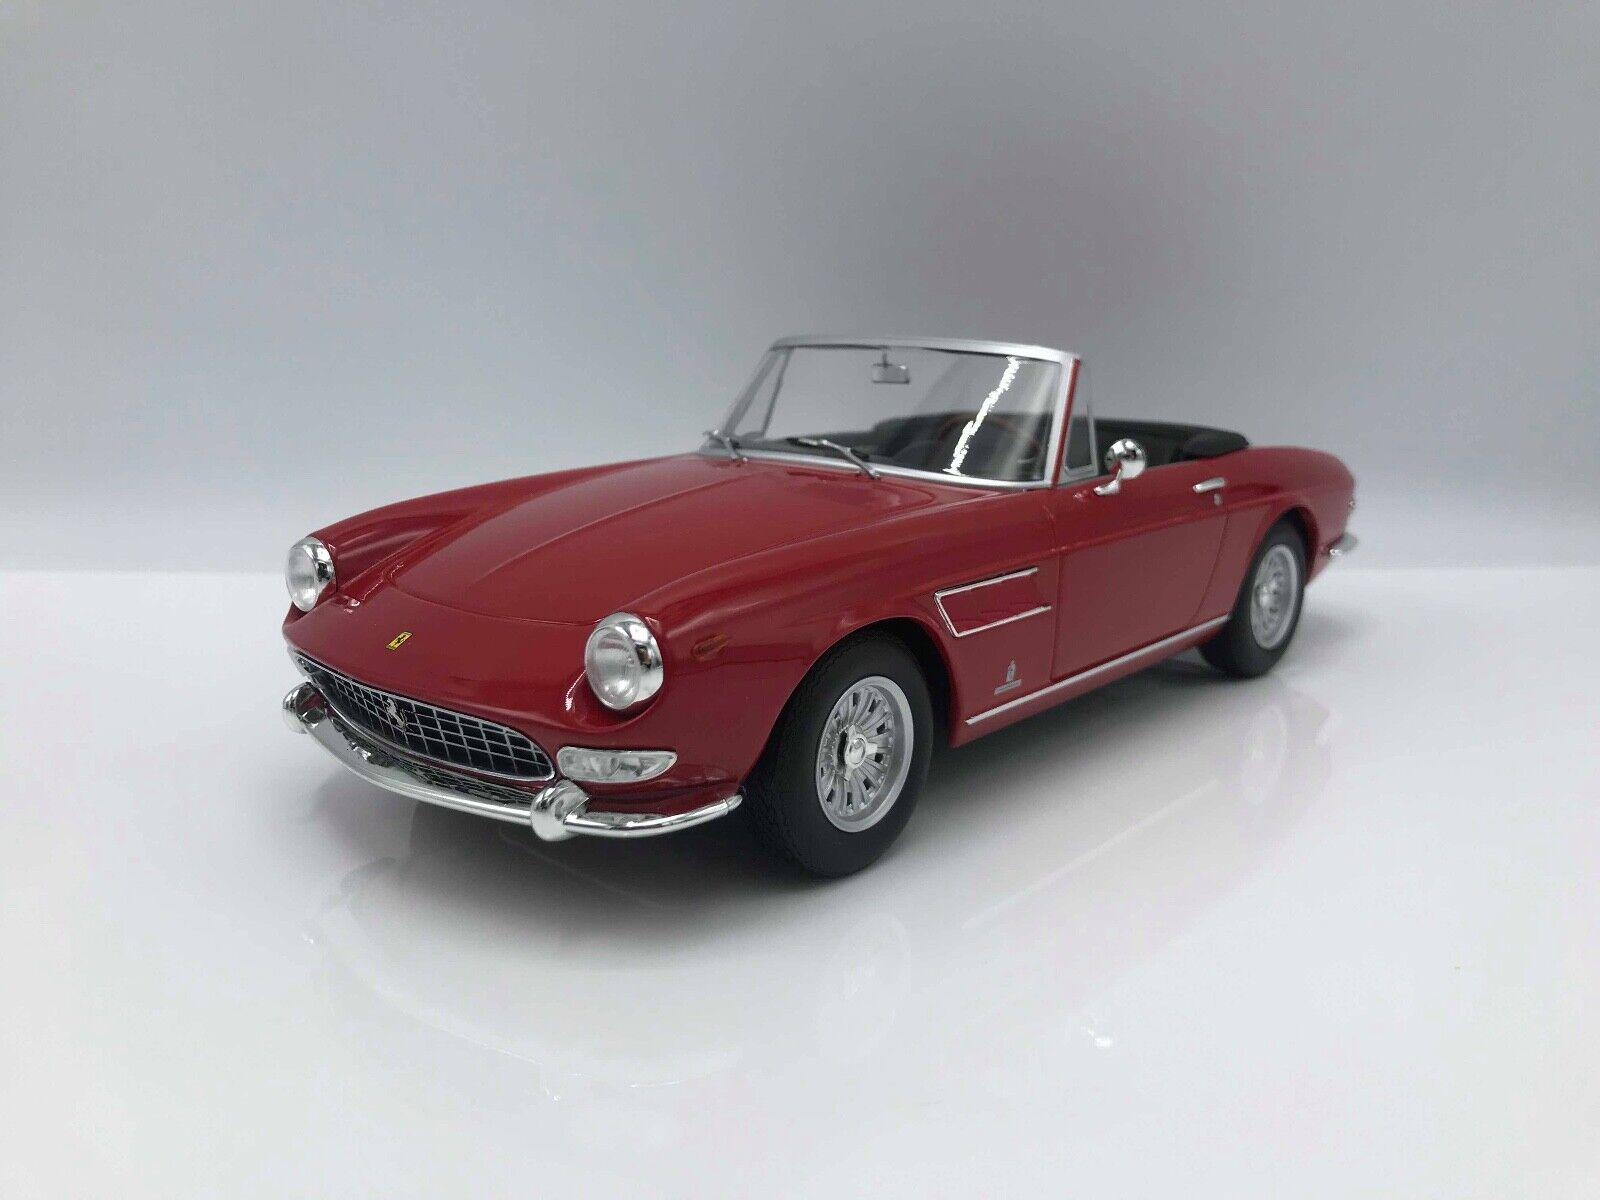 Ferrari 275 GTS Pininfarina Spyder rot (Stahlfelgen) 1964 -1 18 KK-Scale   NEW